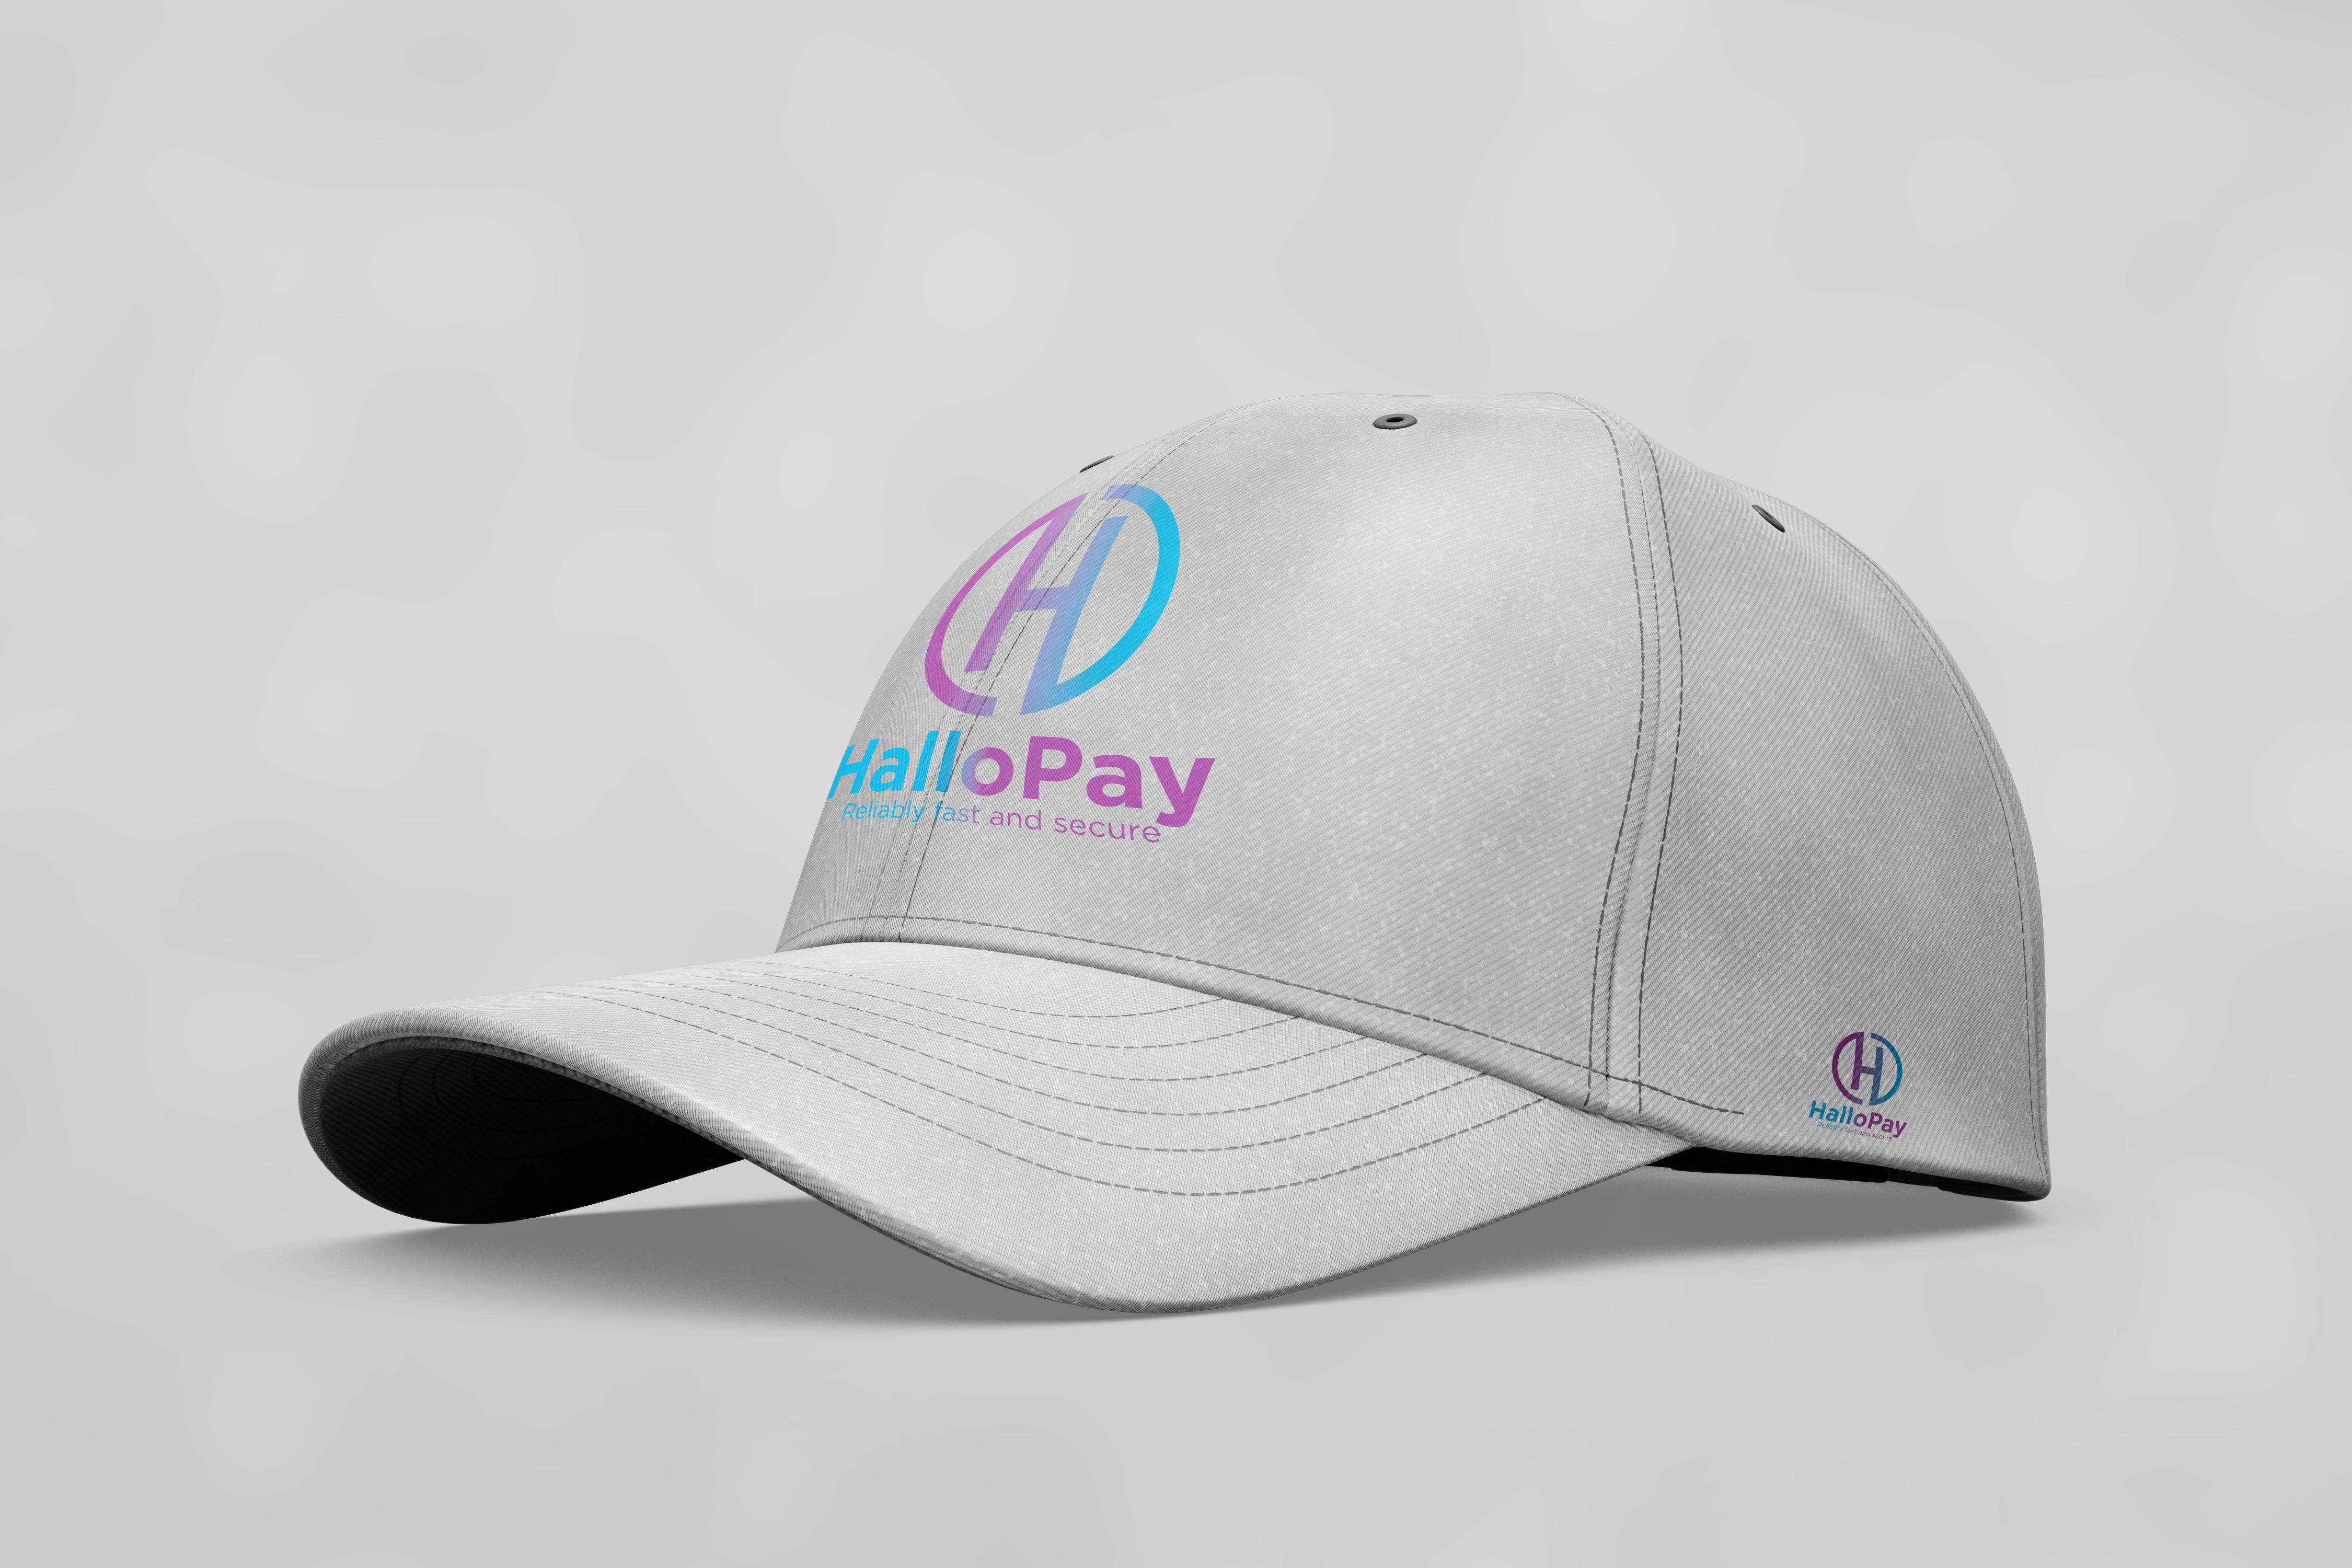 hallopay cap